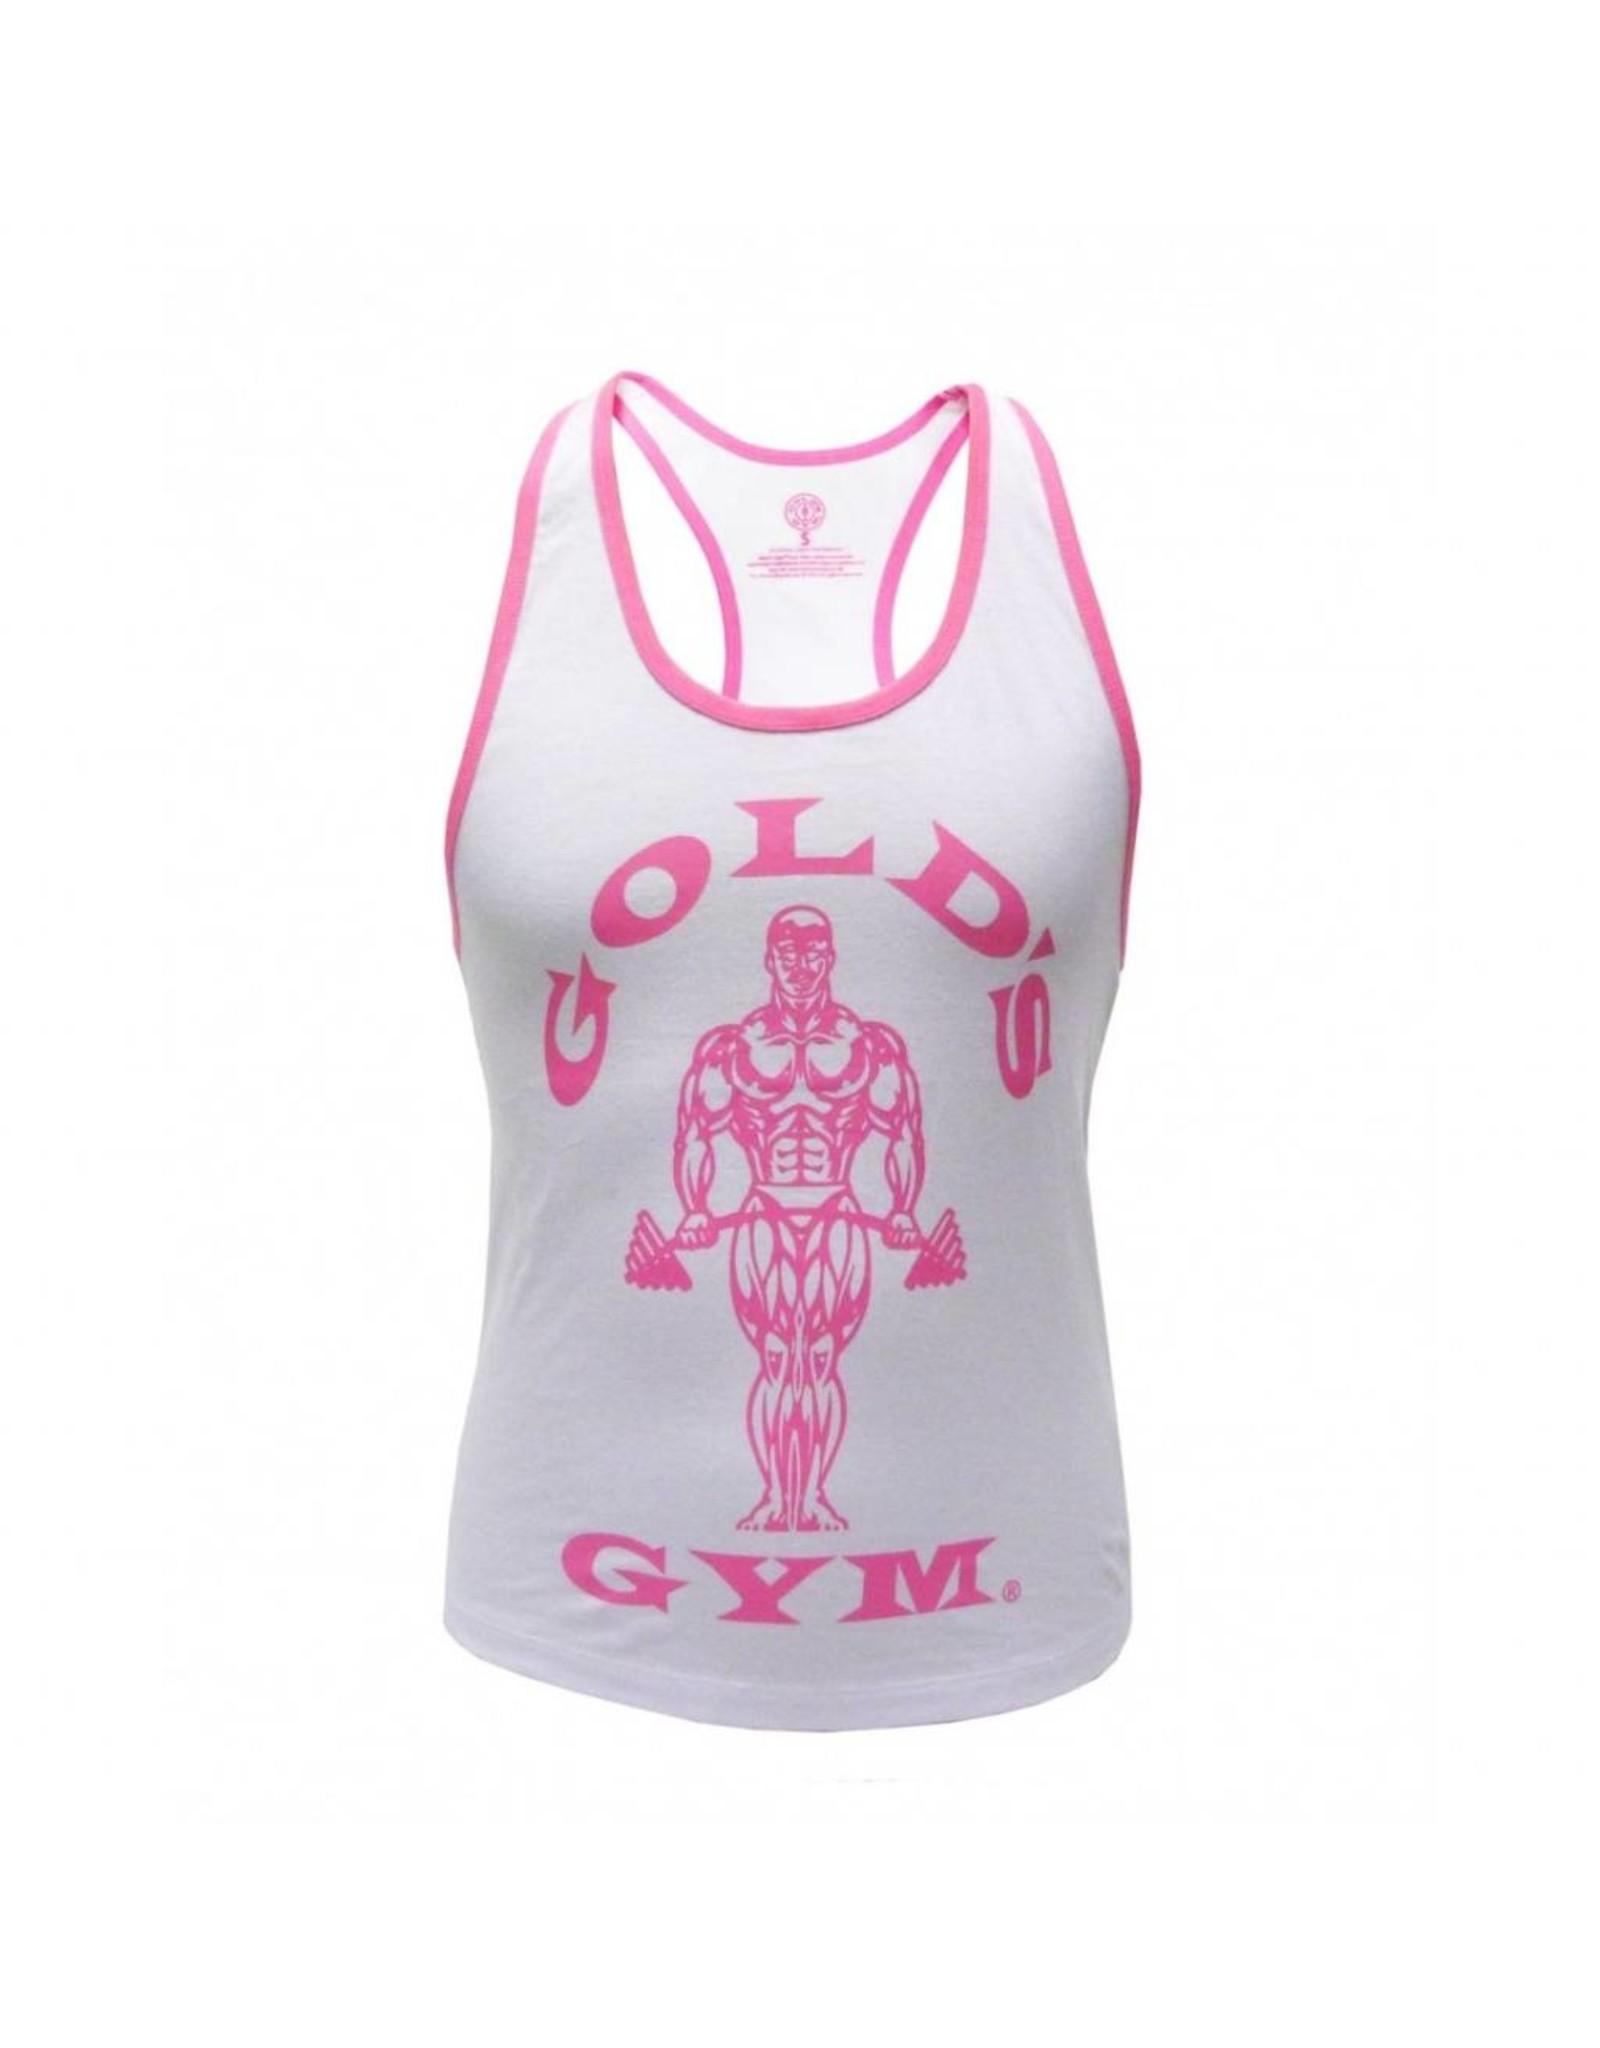 Gold's Gym Muscle Joe Ladies Premium Stringer Vest - White